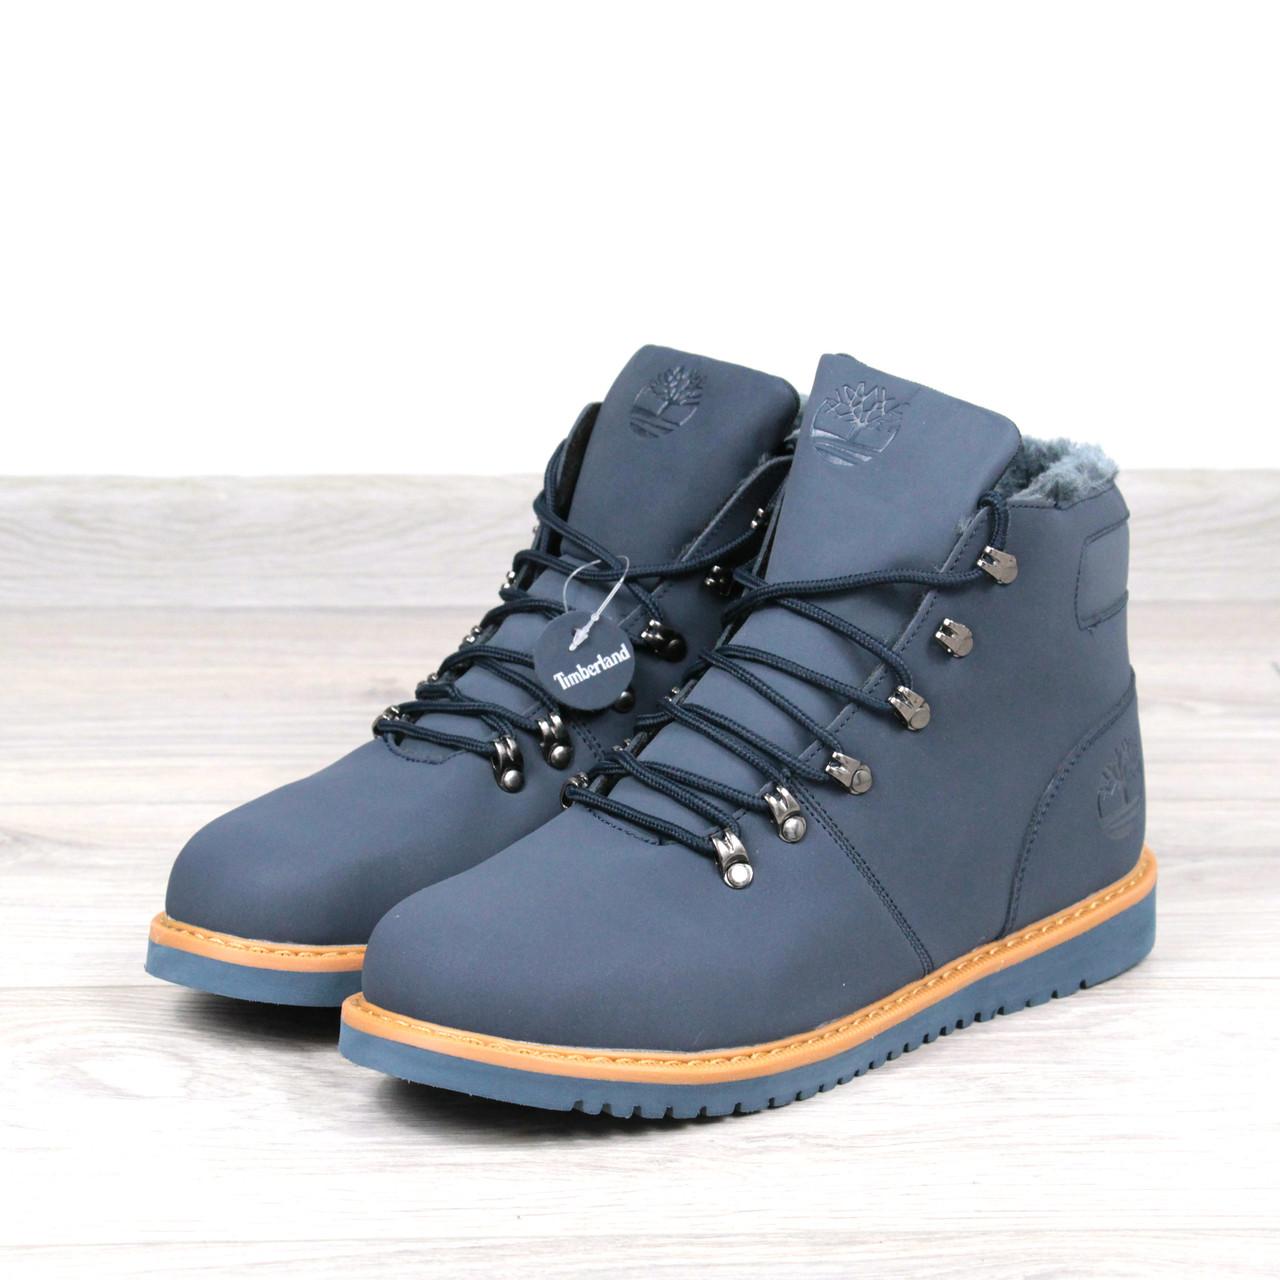 a611b292 Ботинки Мужские зимние Timberland синие мех 3788, зимняя обувь ...